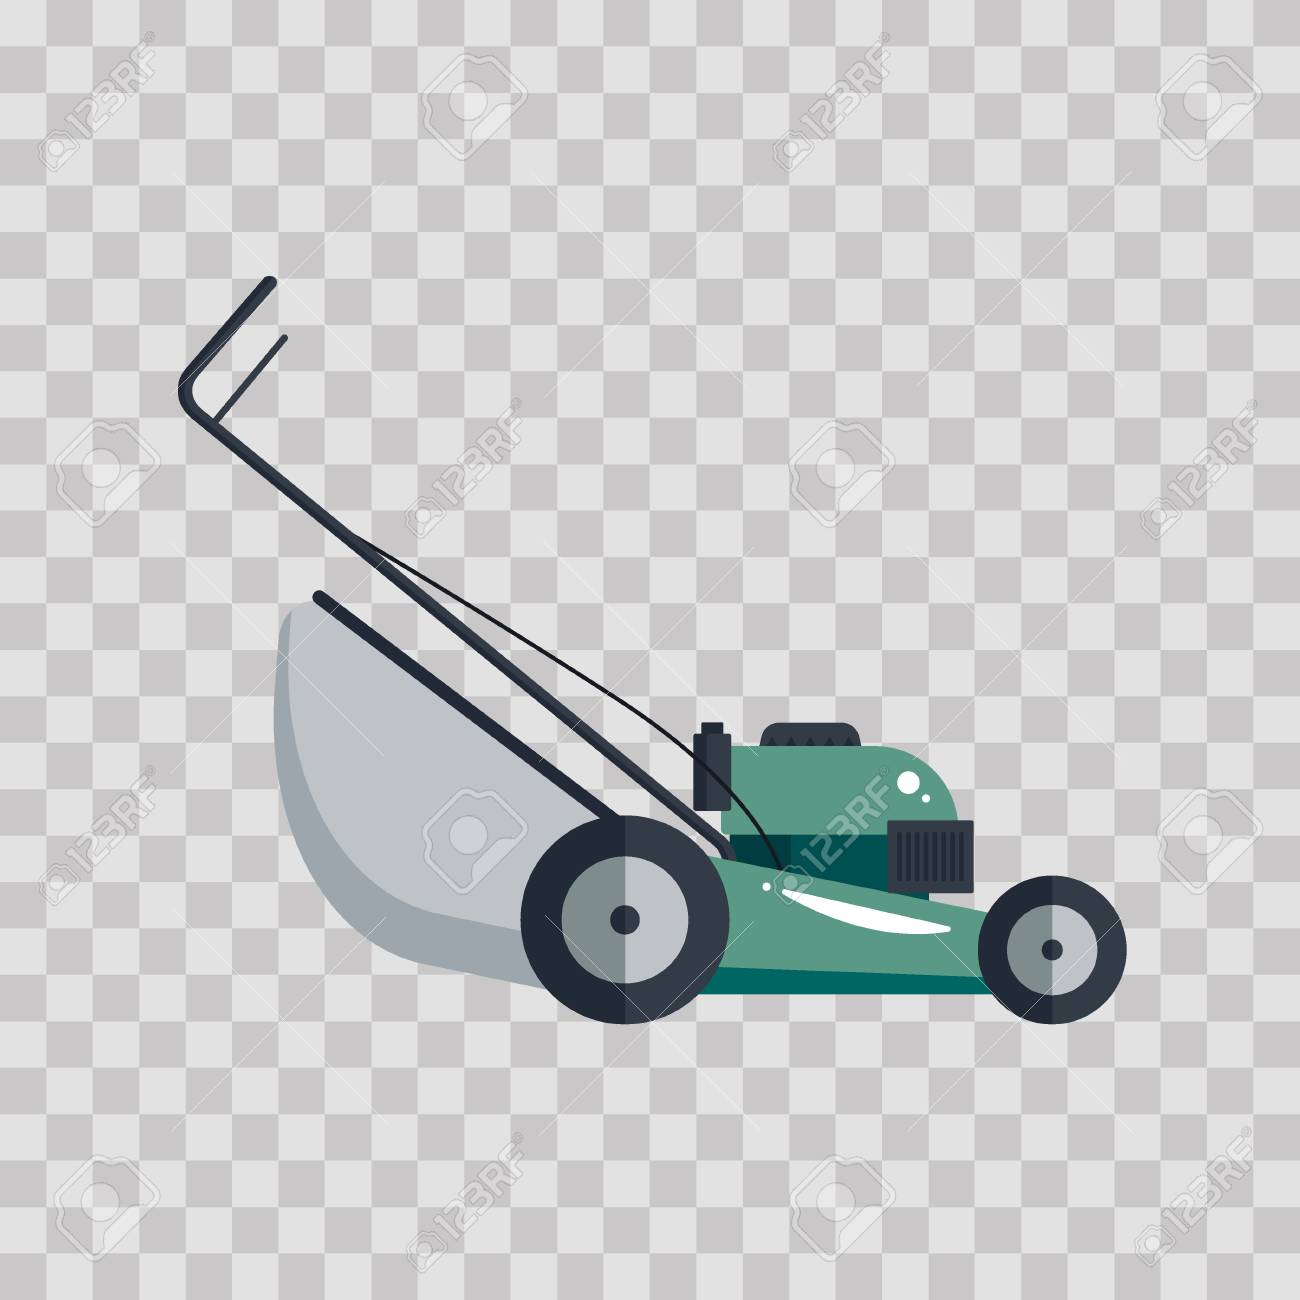 Lawn mower machine icon technology equipment tool, gardening grass-cutter on transparent background - vector illustration - 115033269